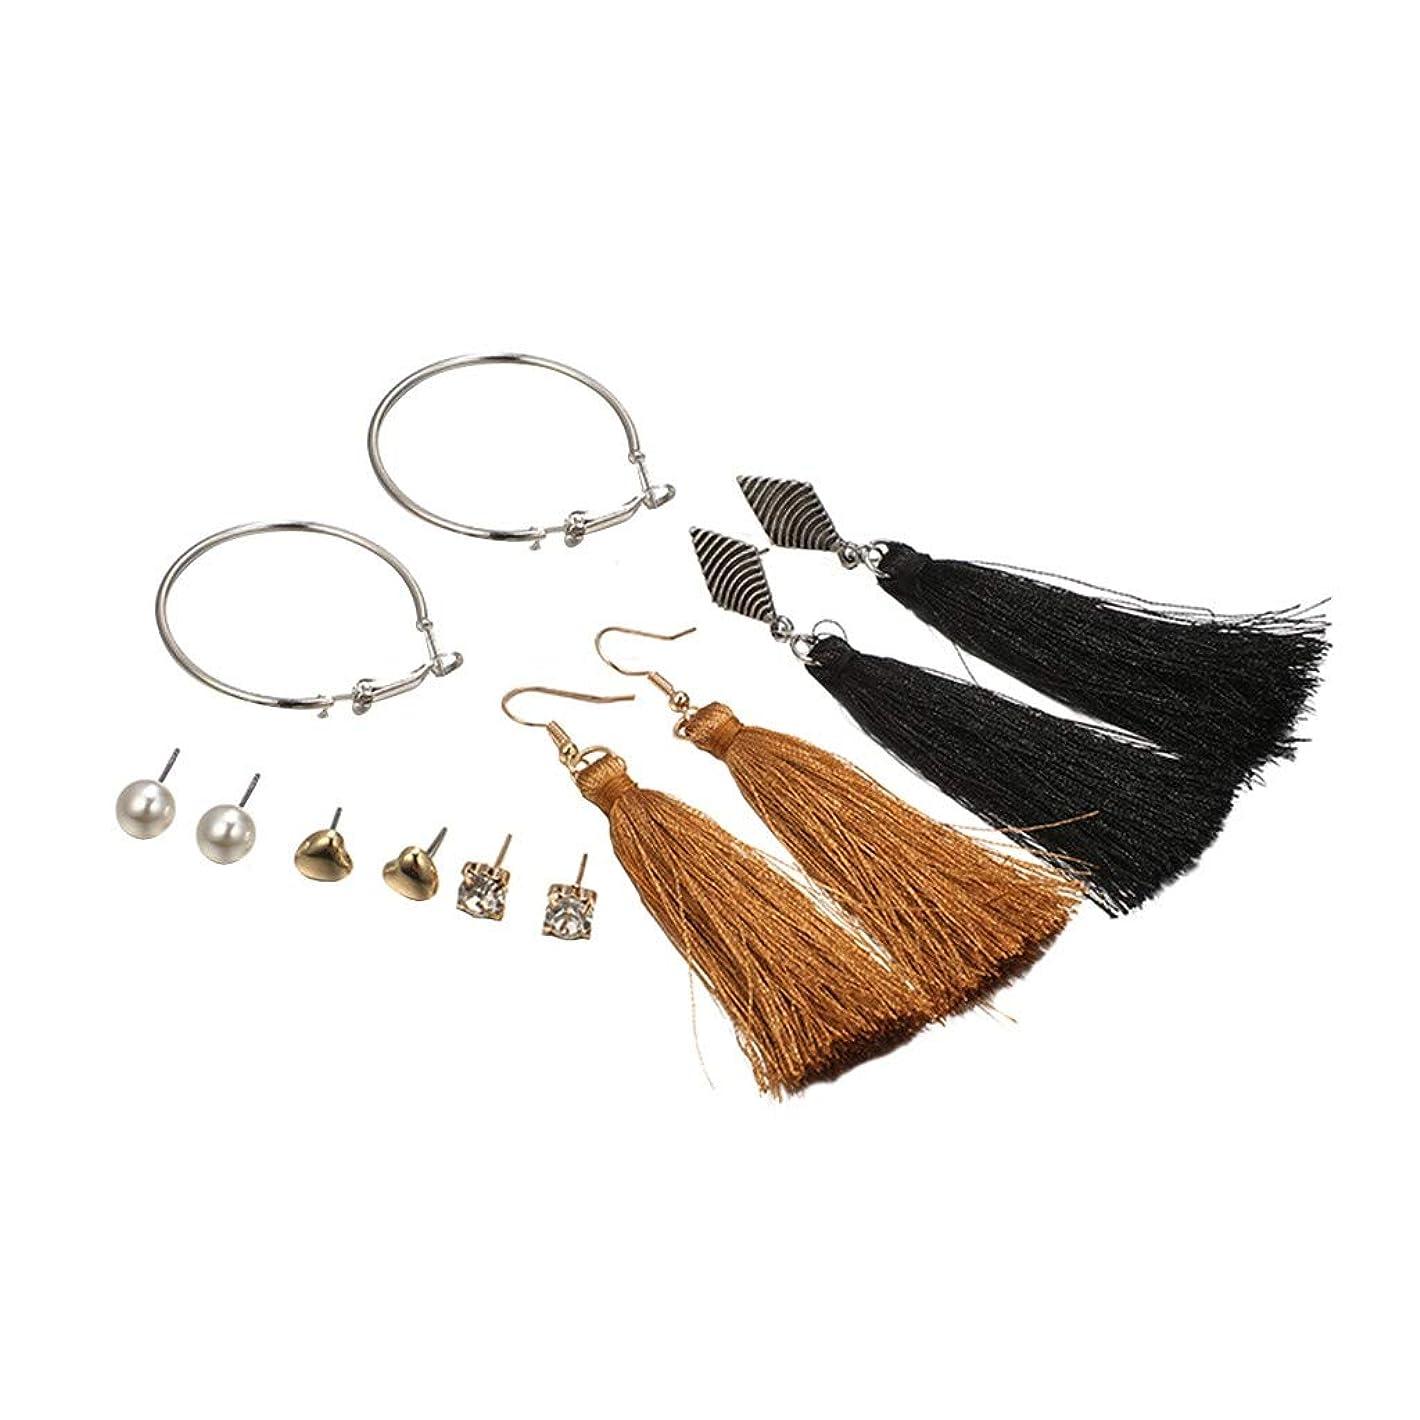 Nicircle ダイヤモンドハートレトロロングタッセルイヤリングスタッドピアスセットサークルパール Circle Pearl Set With Diamond Heart Retro Long Tassel Ear Stud Earrings